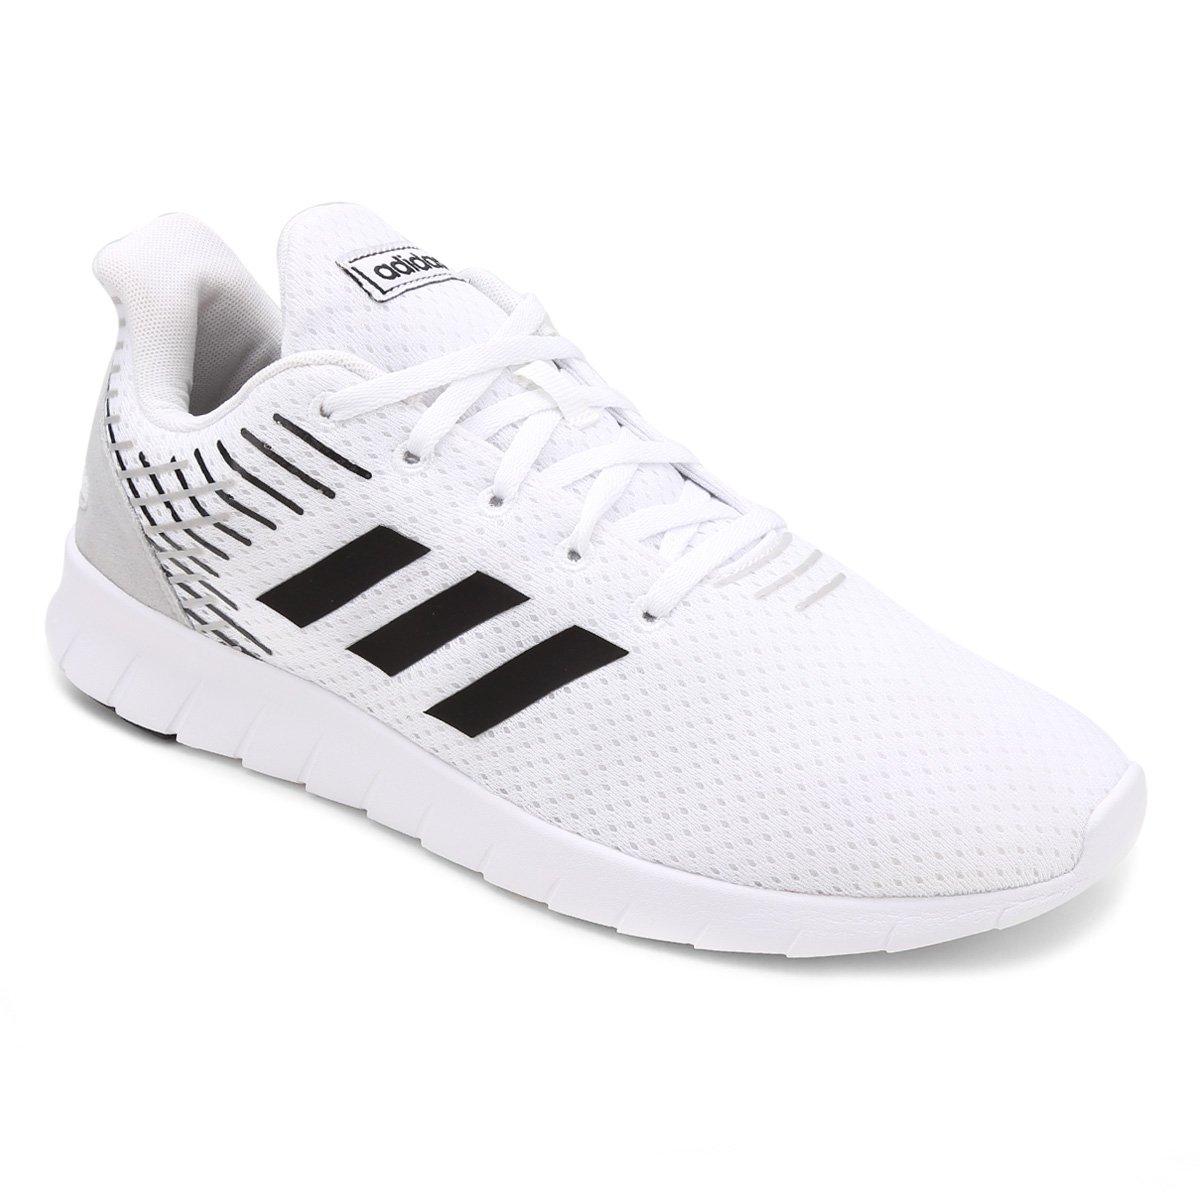 657ce52f295 Tênis Adidas Asweerun Masculino - Branco e Preto - Compre Agora ...